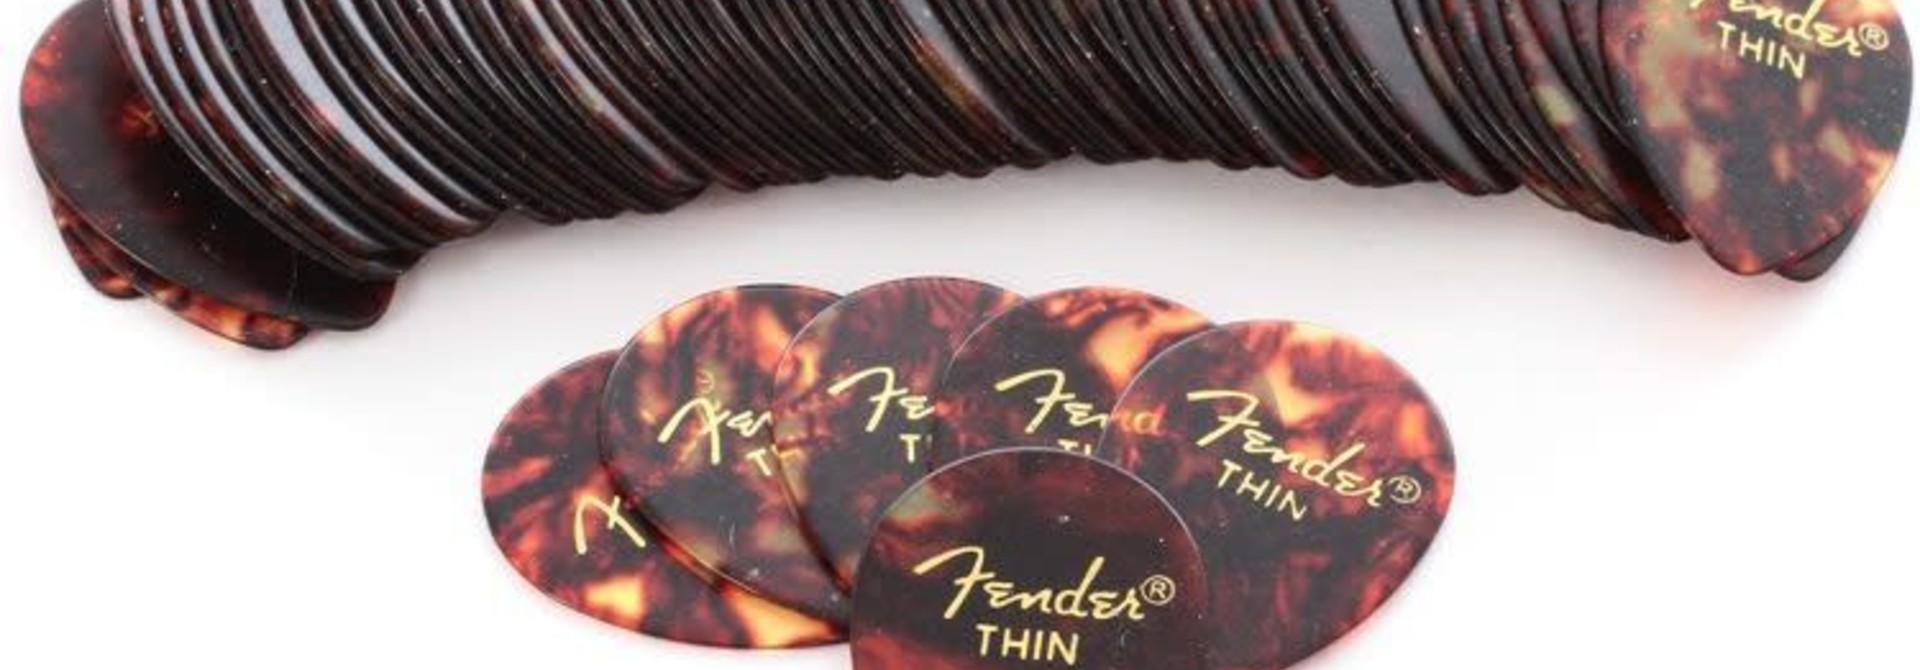 Fender Celluloid 358 Thin ( 12 pk)